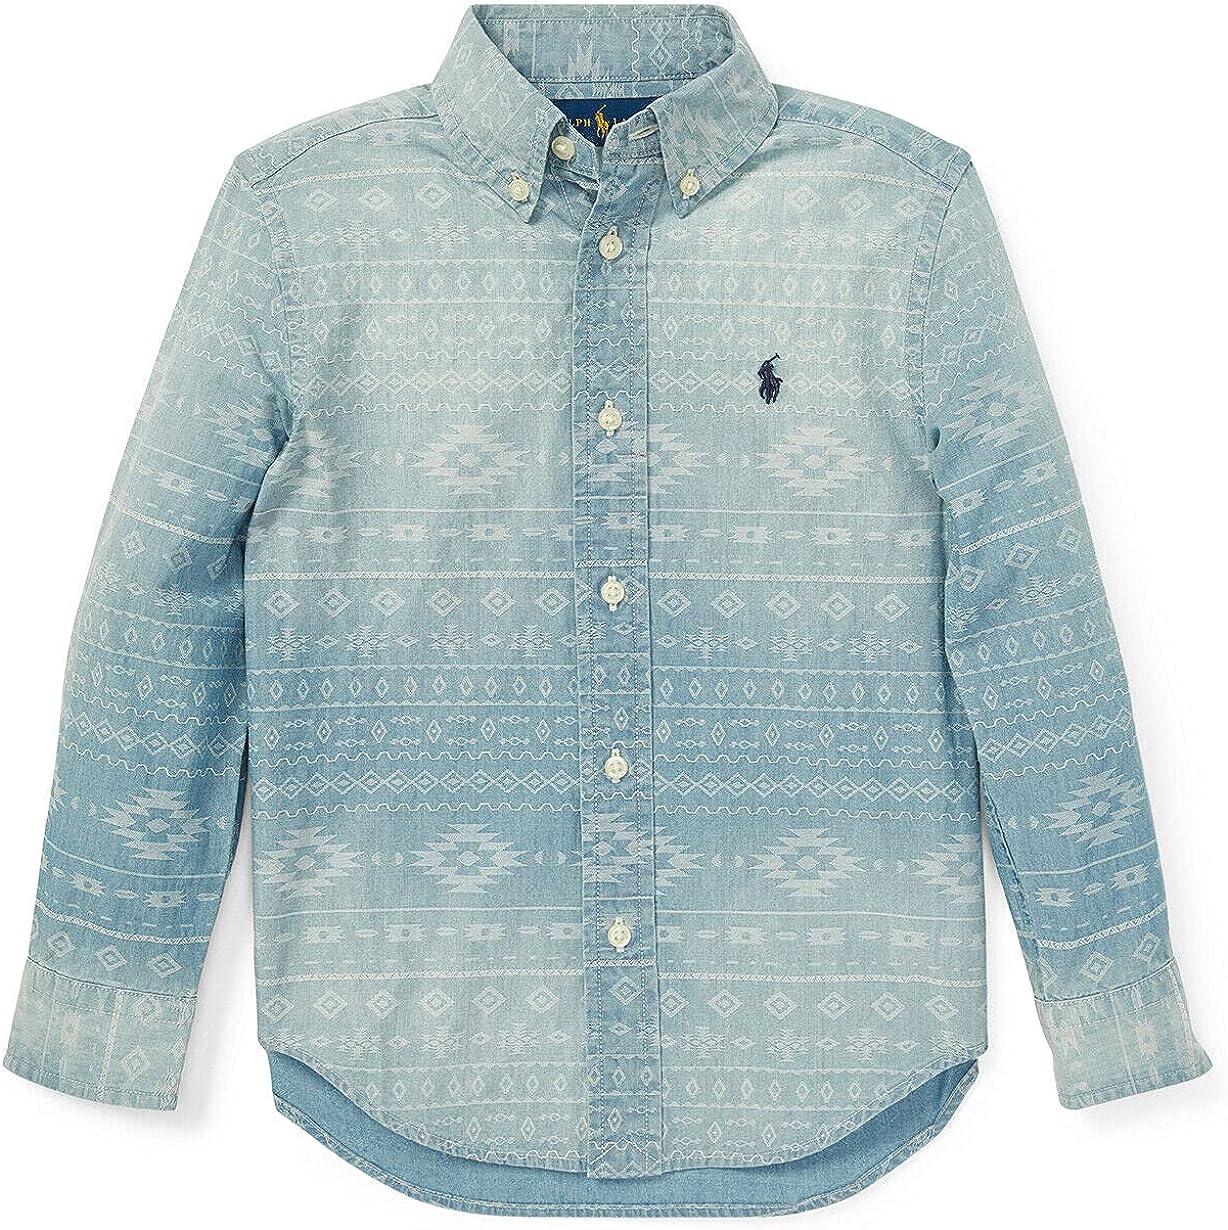 Polo Ralph Lauren Blue Boys Chambray Southwestern Tribal Oxford Shirt 2/2T